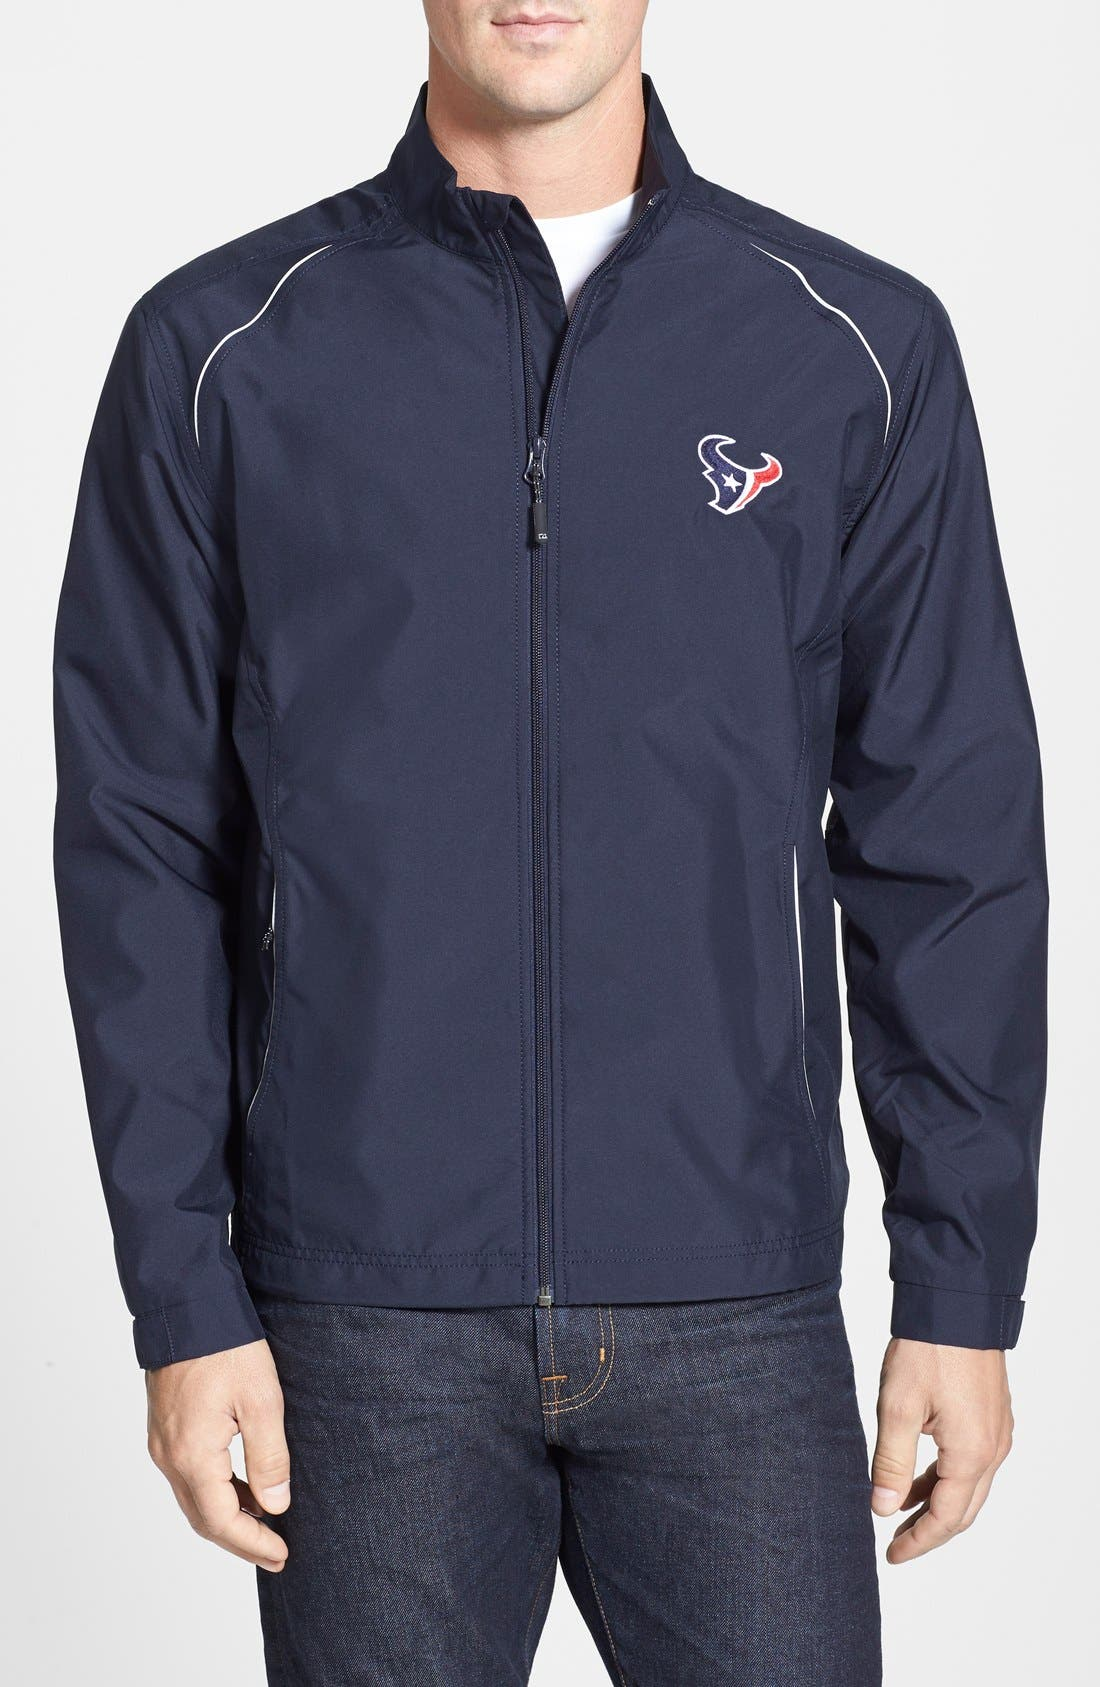 Cutter & Buck Houston Texans - Beacon WeatherTec Wind & Water Resistant Jacket